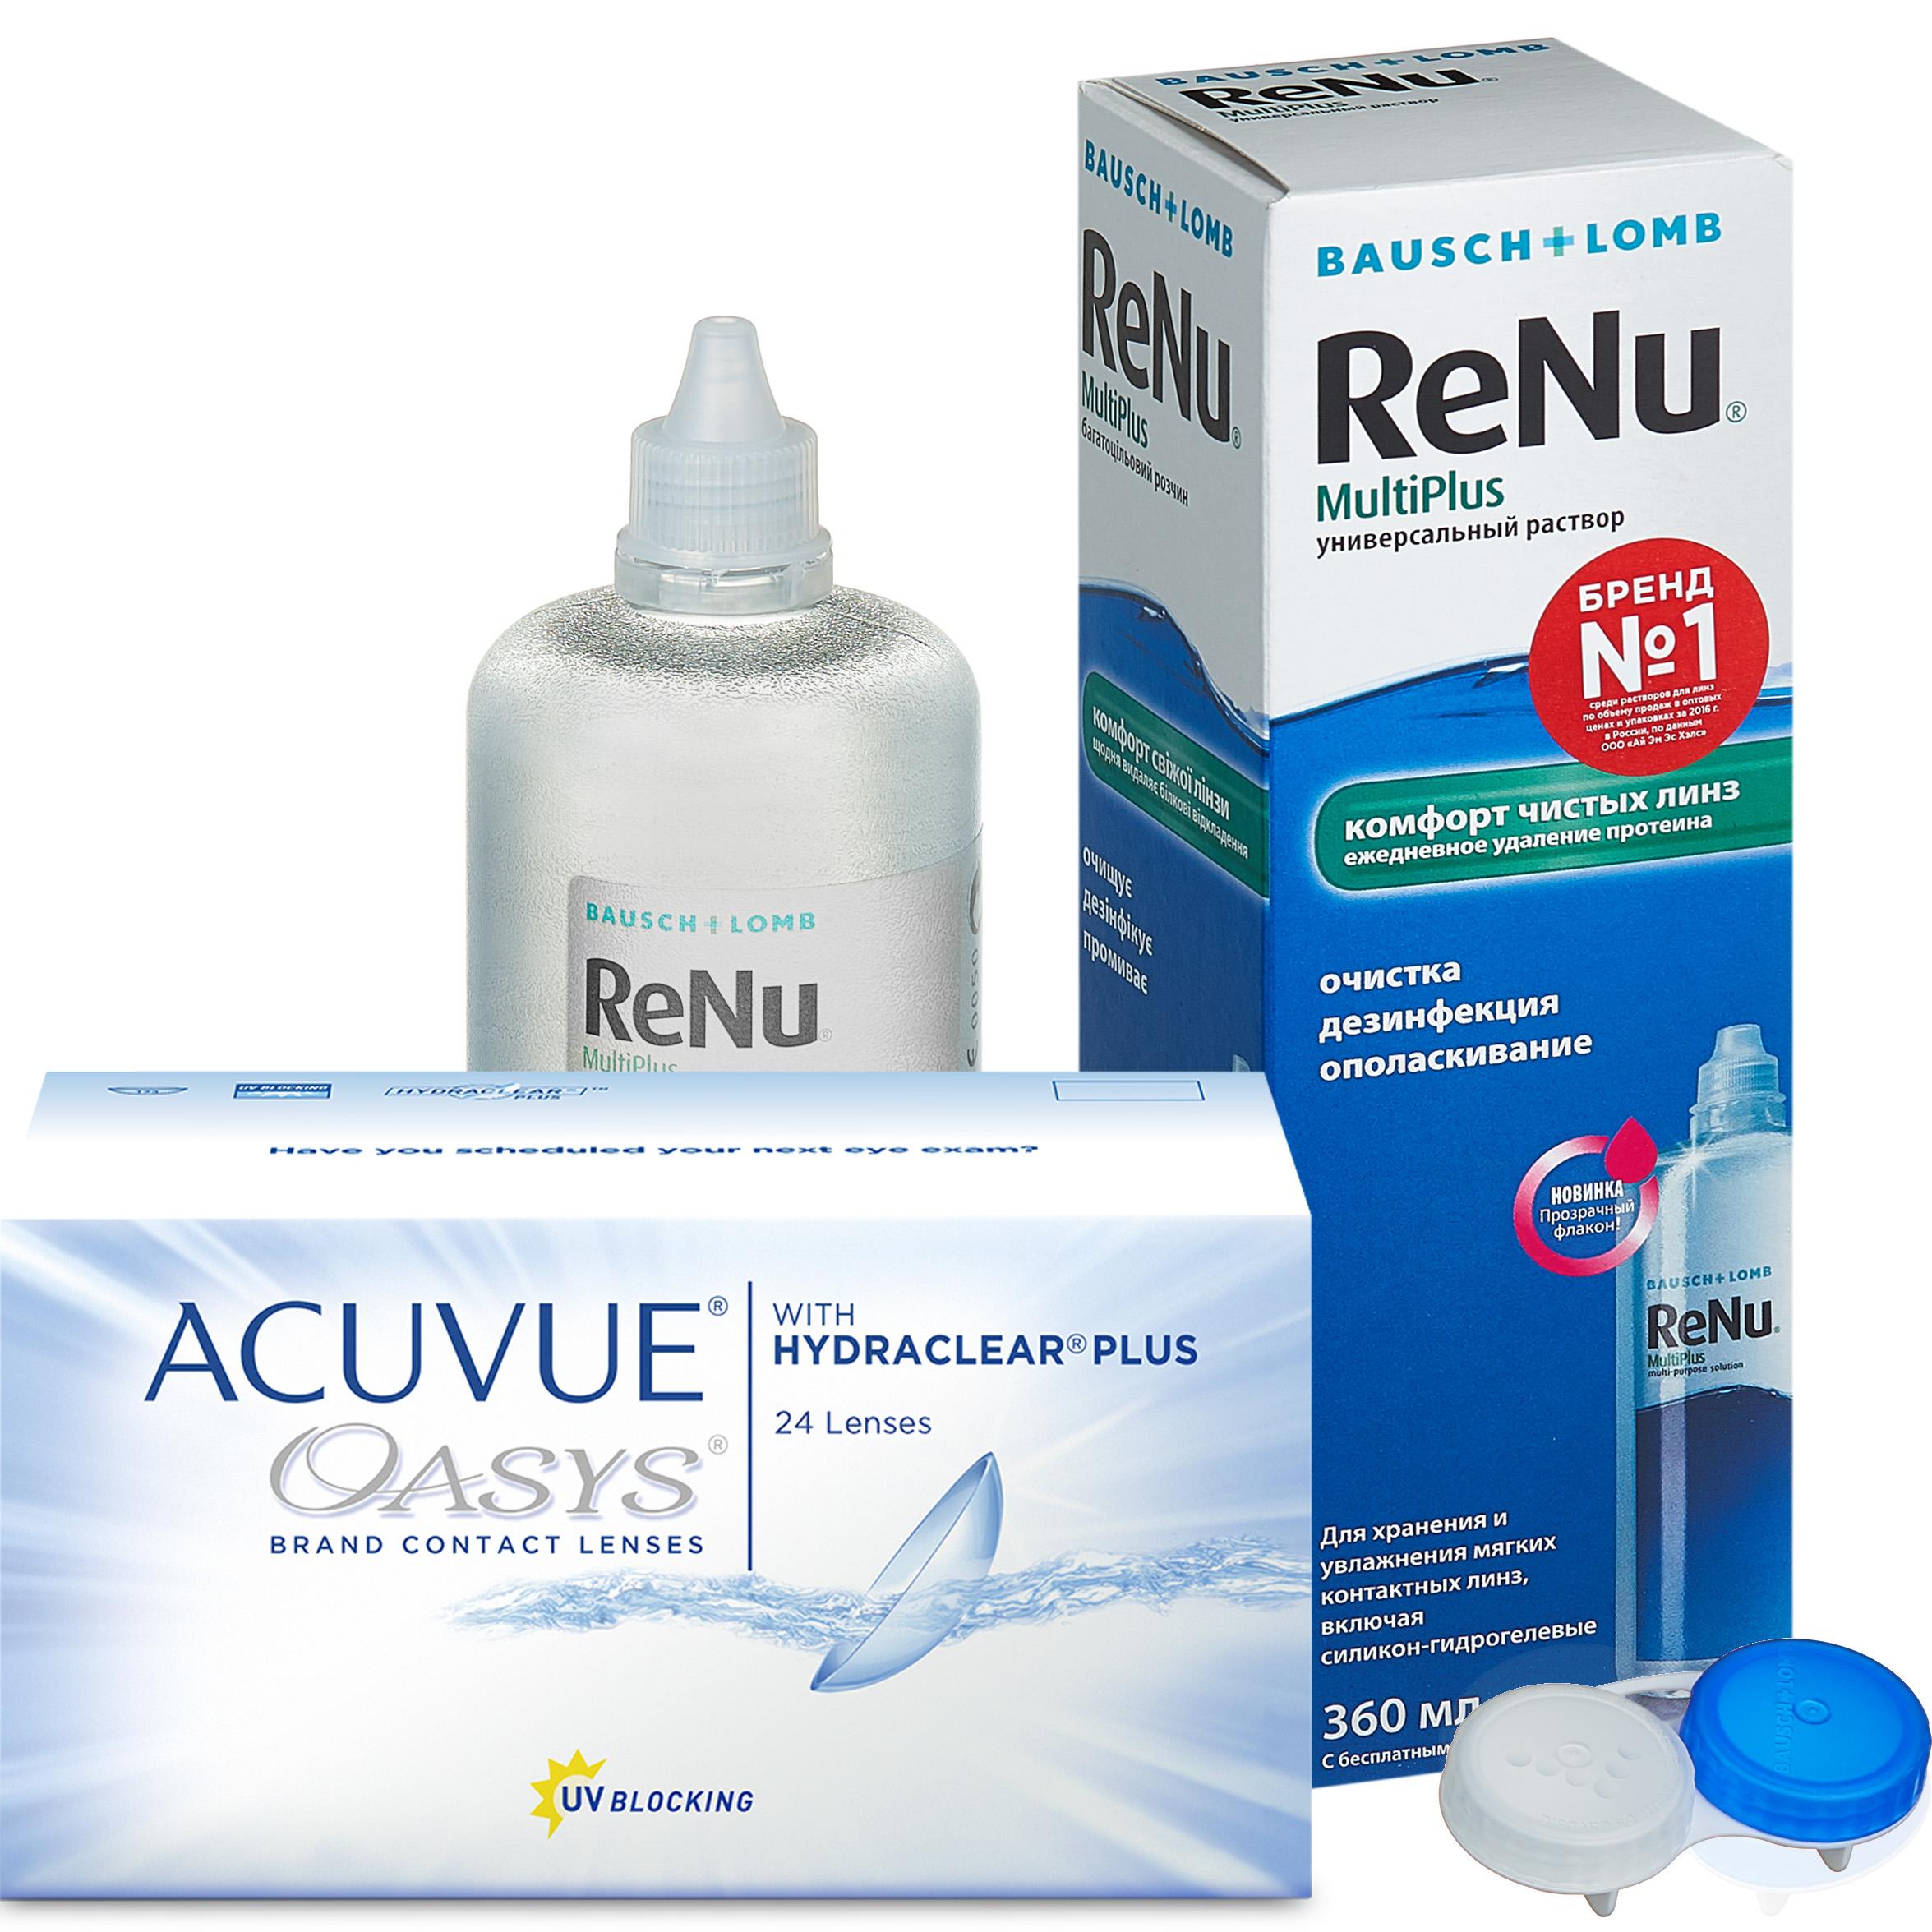 Купить Oasys with Hydraclear Plus 24 линзы + ReNu MultiPlus, Линзы Acuvue Oasys with Hydraclear Plus 24 линзы R 8.4 -10, 50 + ReNu Multi Plus 360 мл